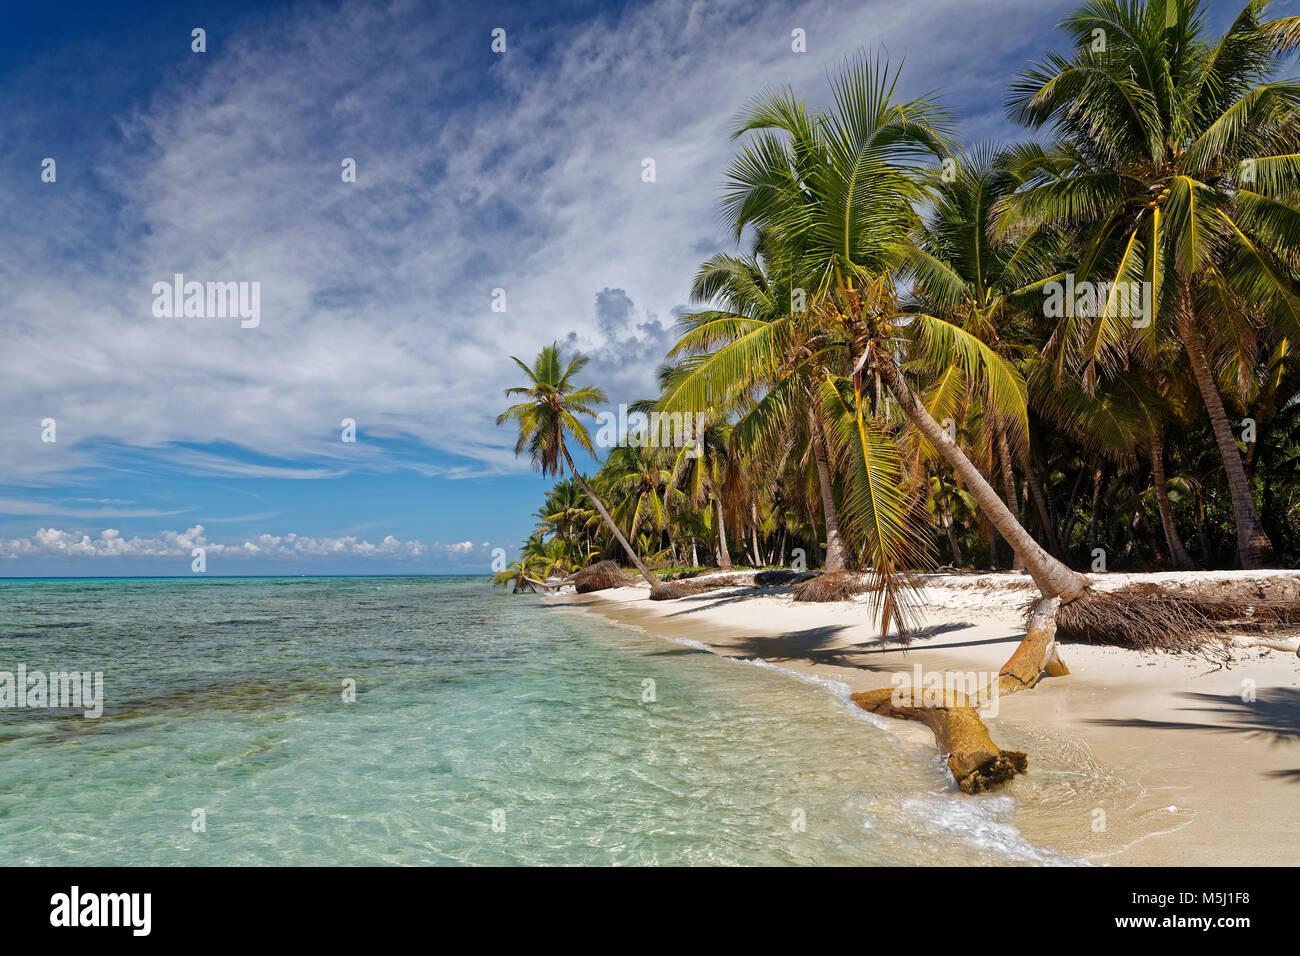 Karibik, Dominikanische Republik, Strand auf der karibischen Insel Isla Saona Stockbild